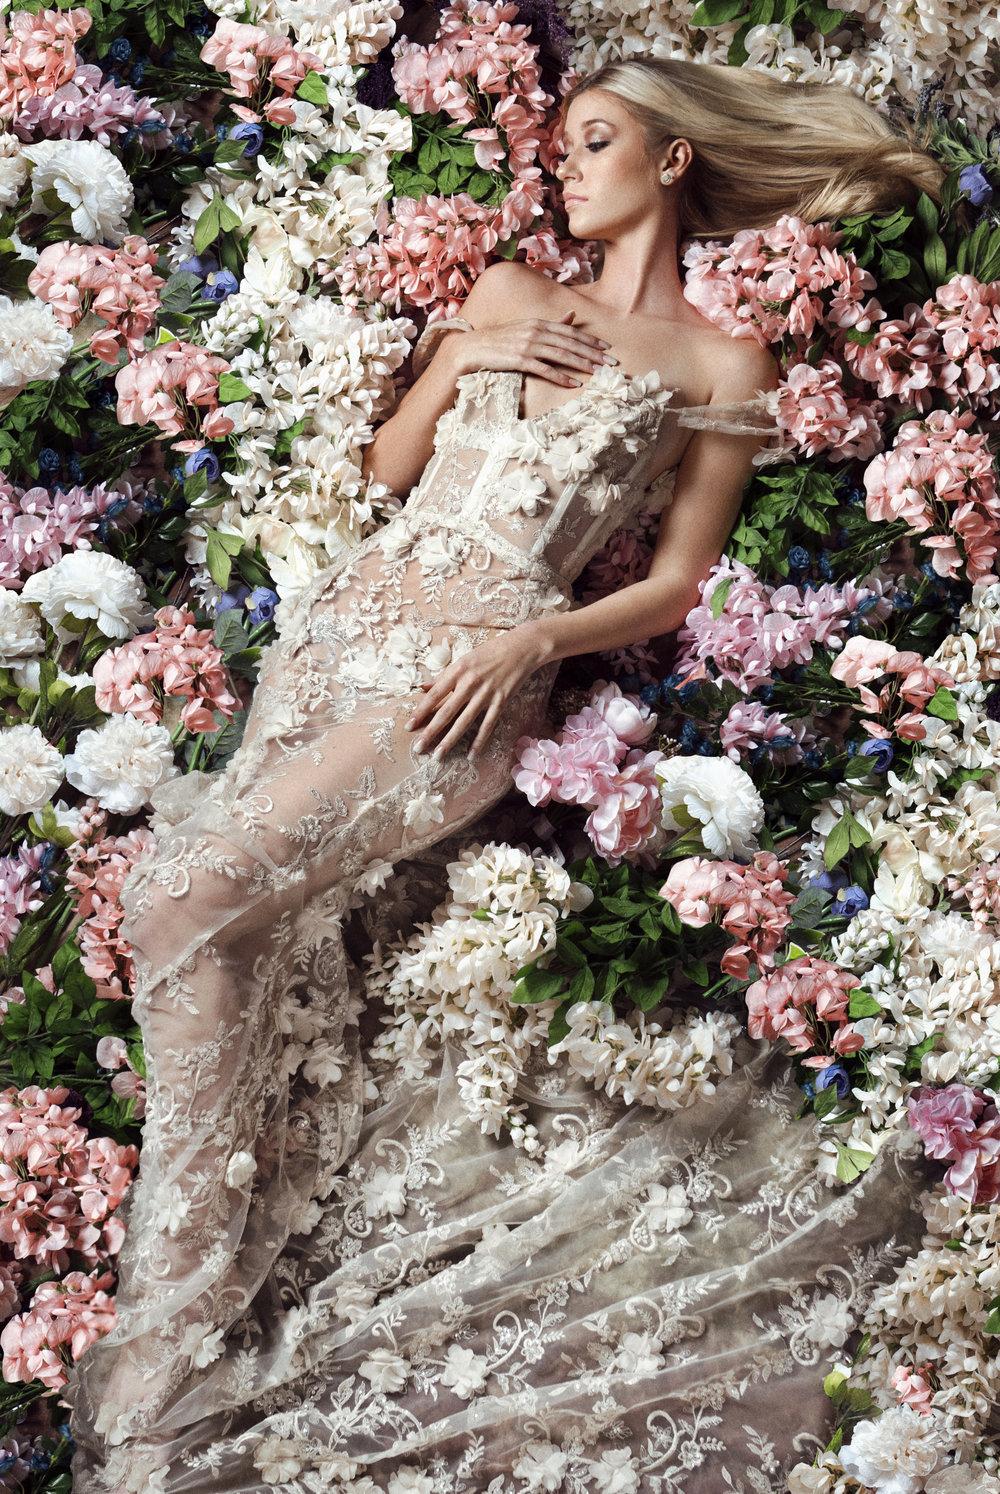 floral rocky edit copy.jpg